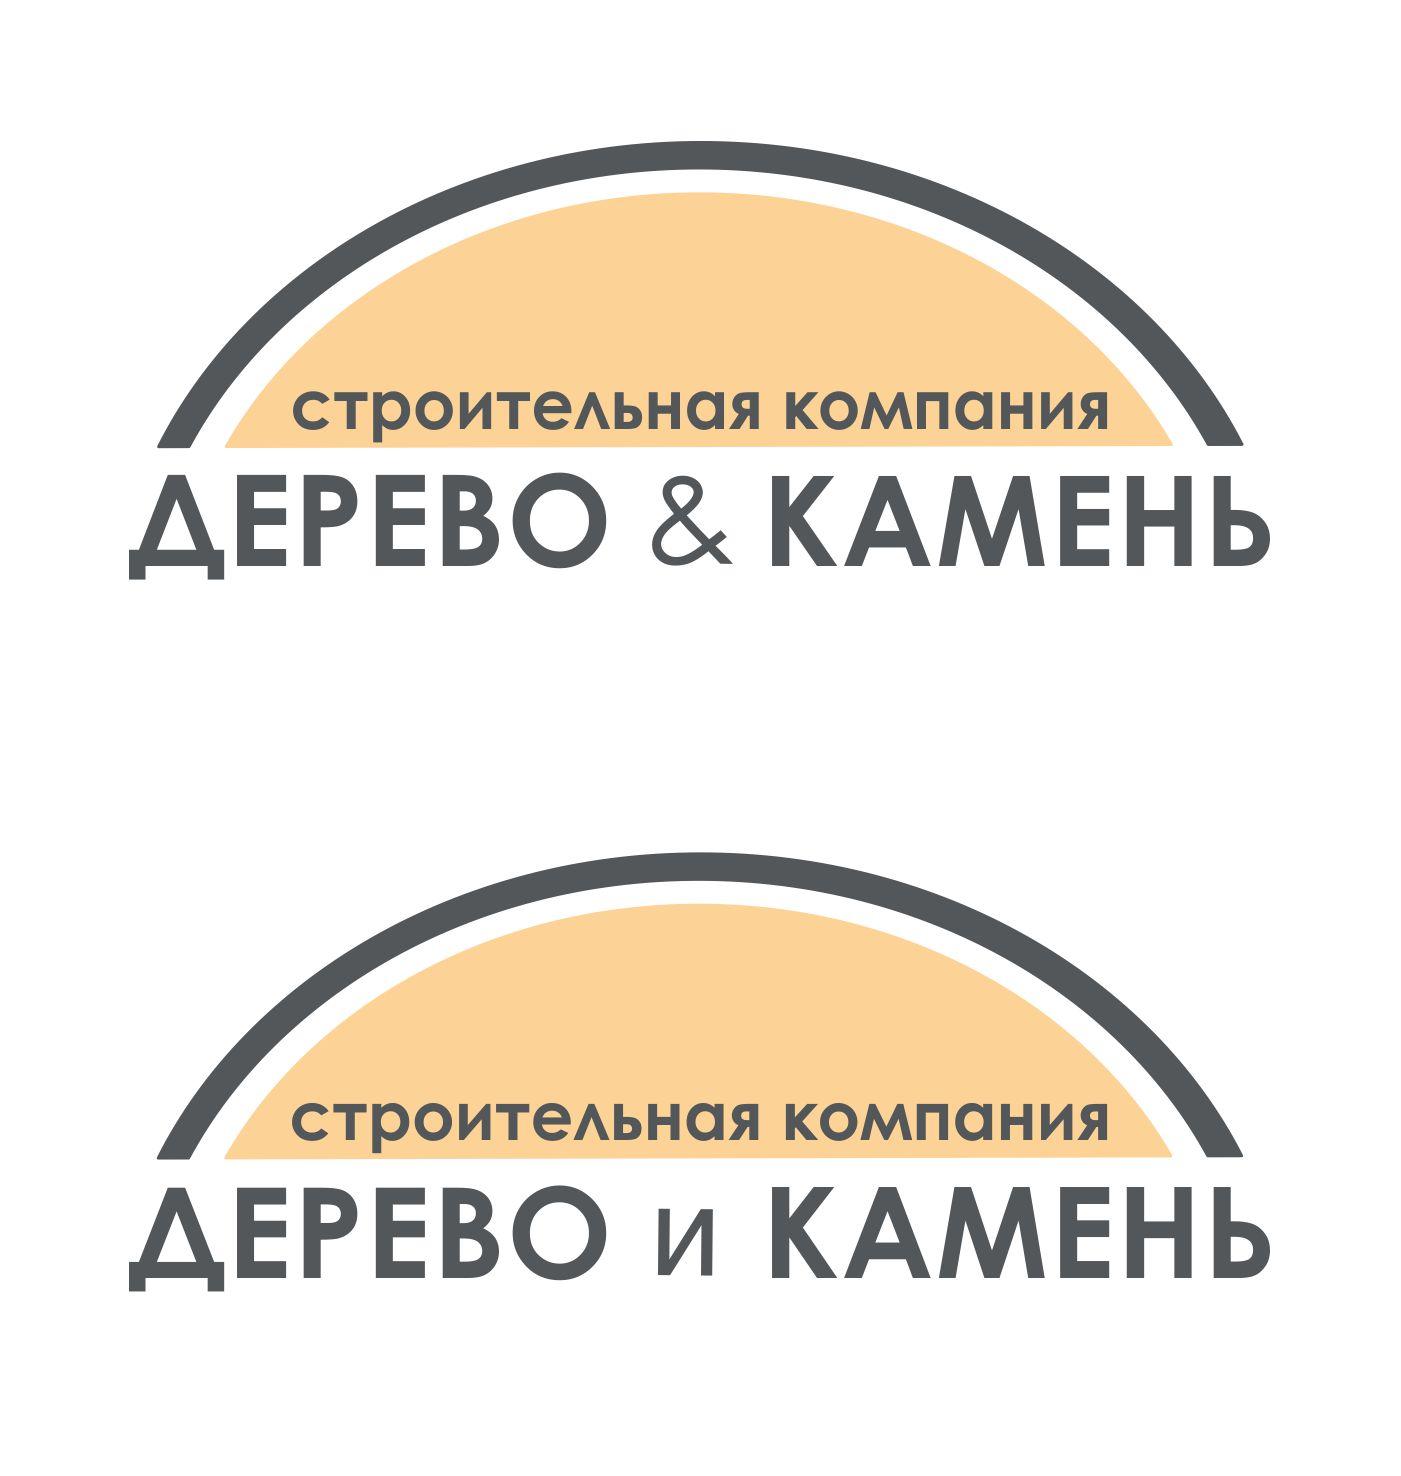 Логотип и Фирменный стиль фото f_29154983c4e64db9.jpg